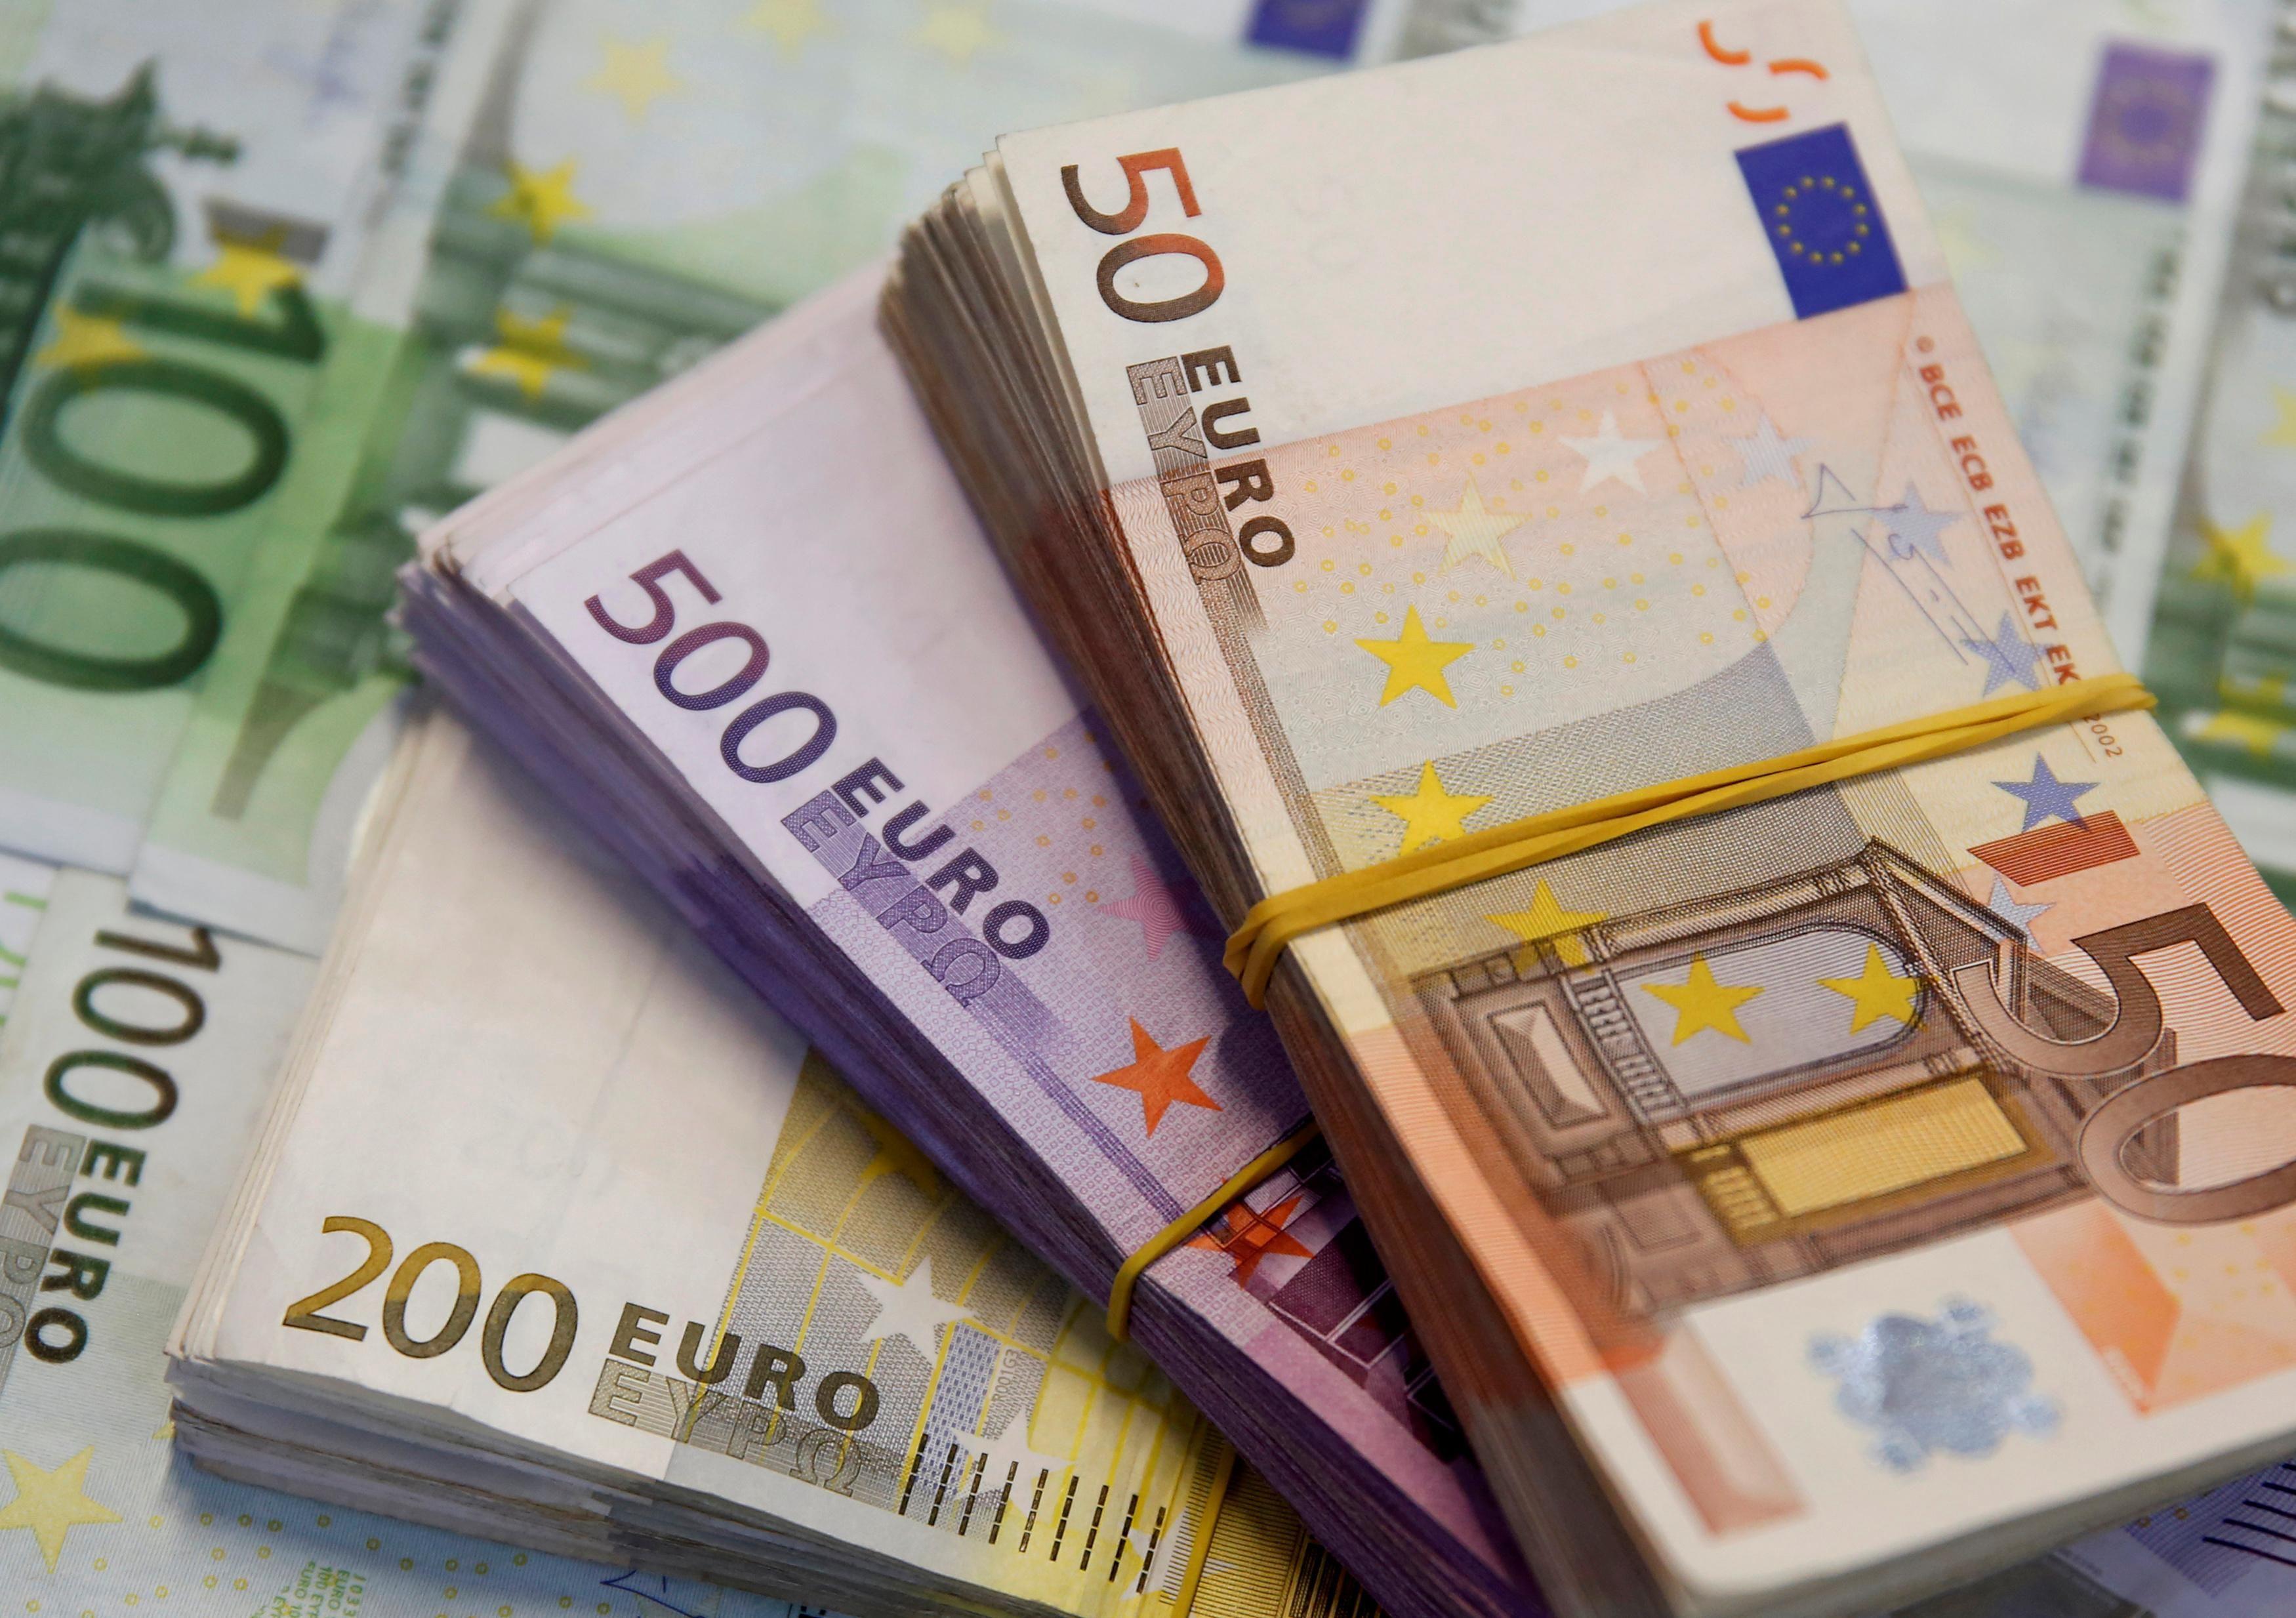 Illustration shows Euro banknotes